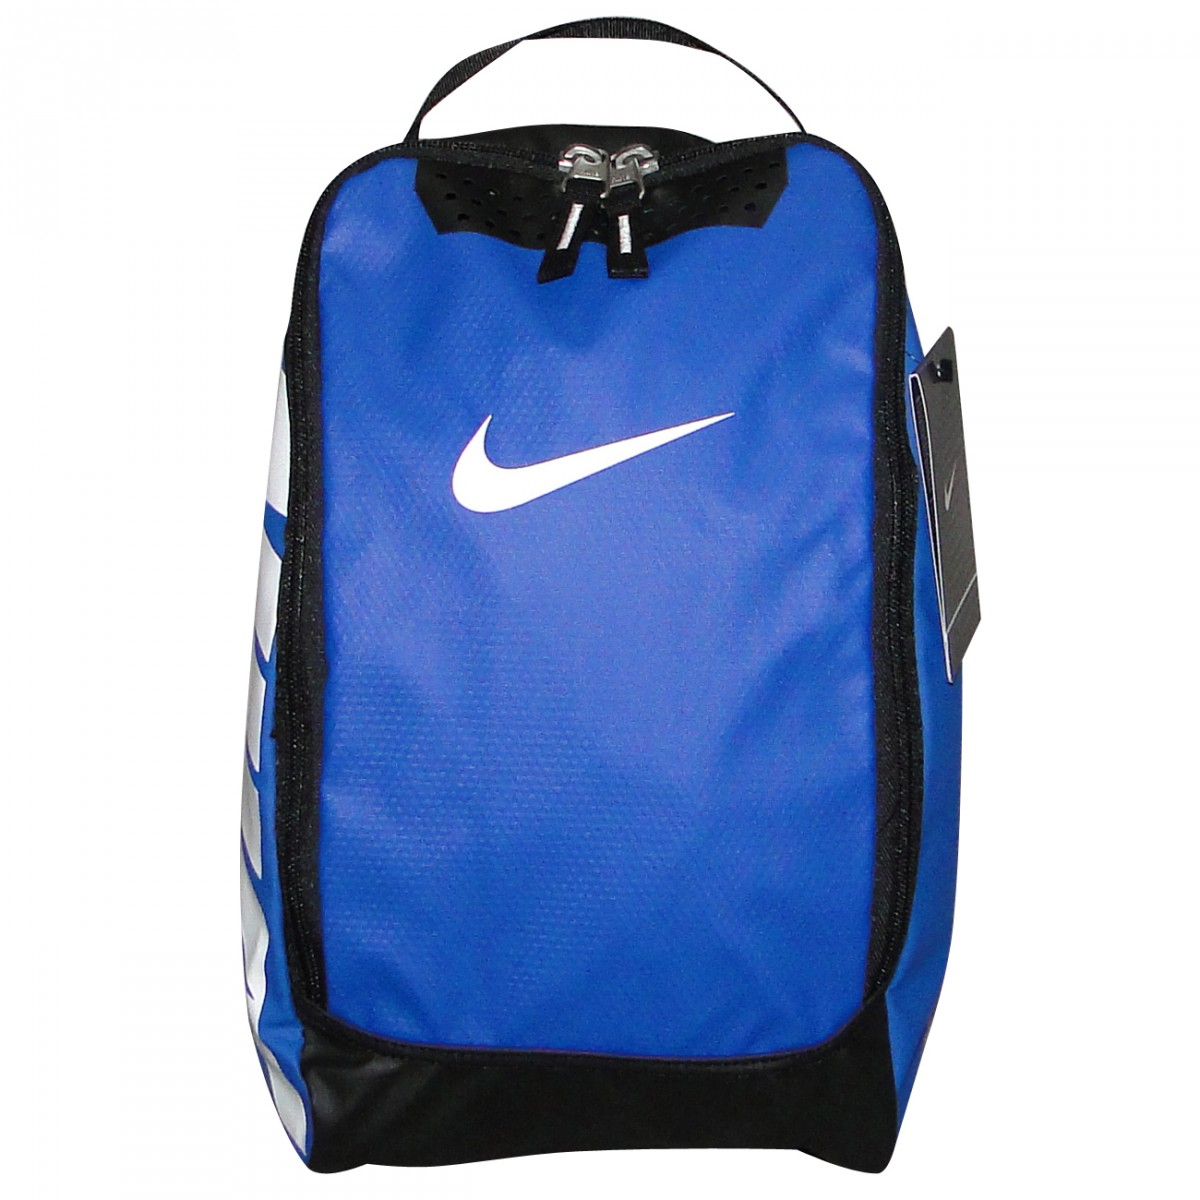 19c09c0b9ef97 Porta Chuteira Nike Ref.Ba4600 BA4600-041 - Azul Branco - Chuteira ...